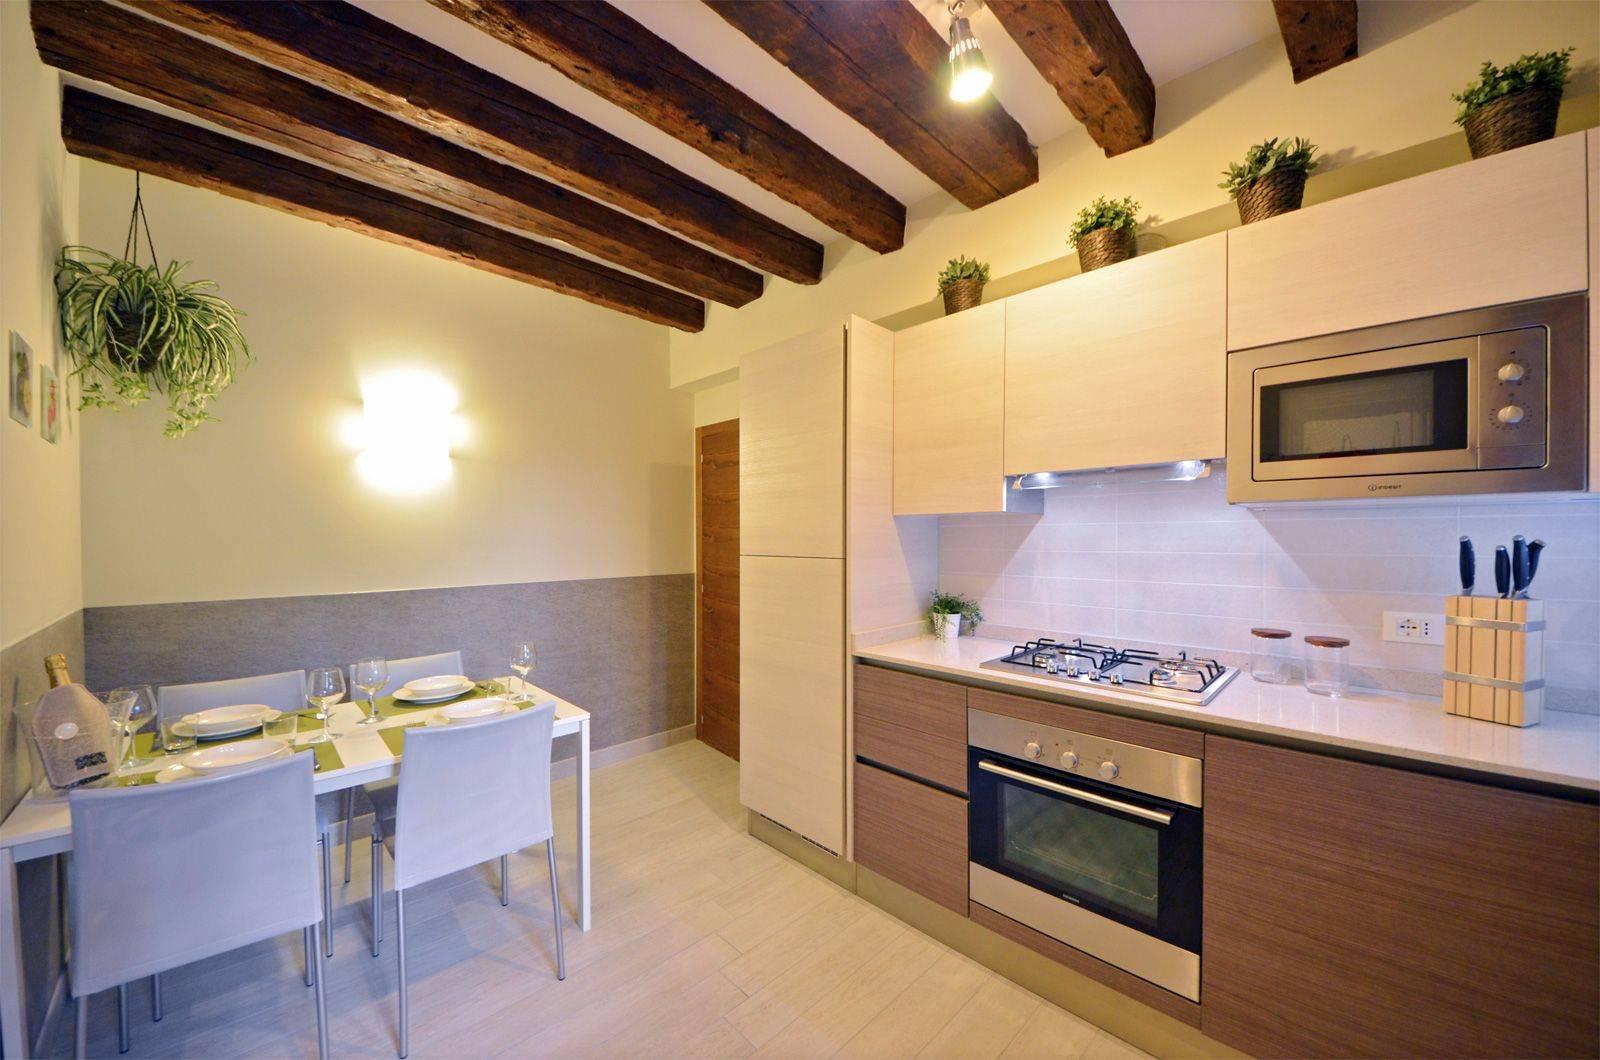 kitchen of the Cà Pesaro Suite